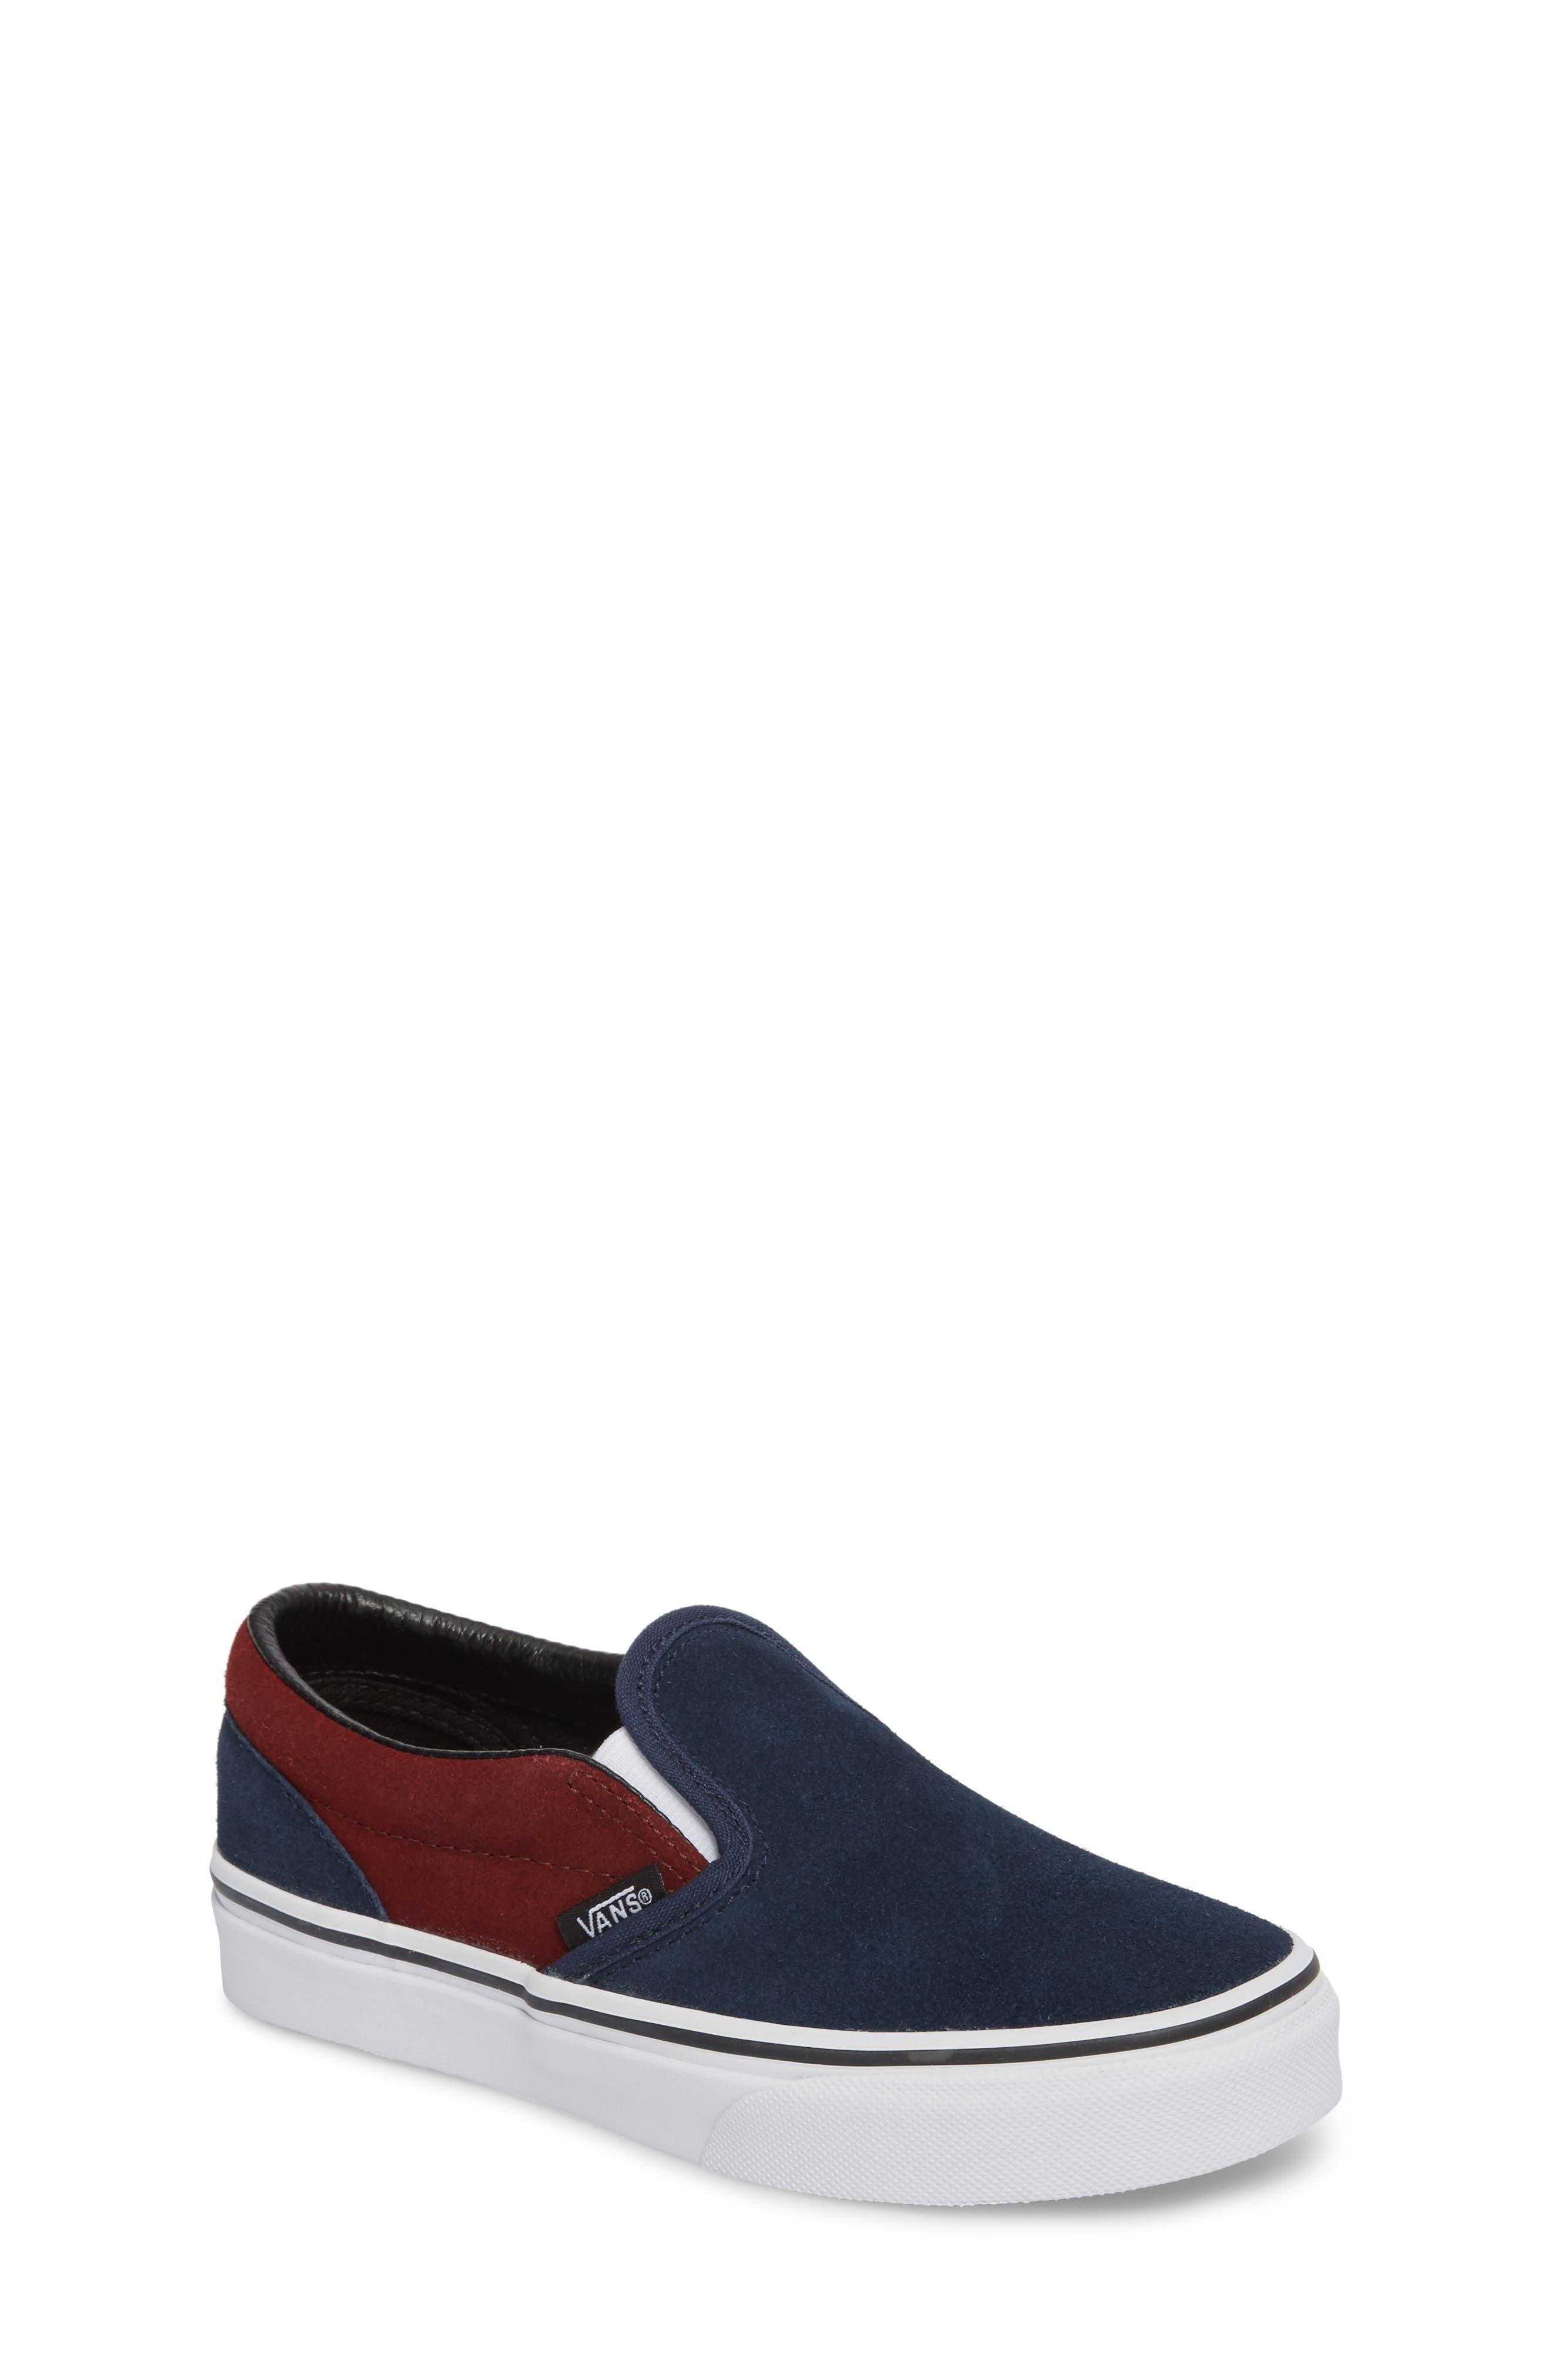 Vans Classic Slip-On Sneaker (Baby, Walker, Toddler, Little Kid & Big Kid)